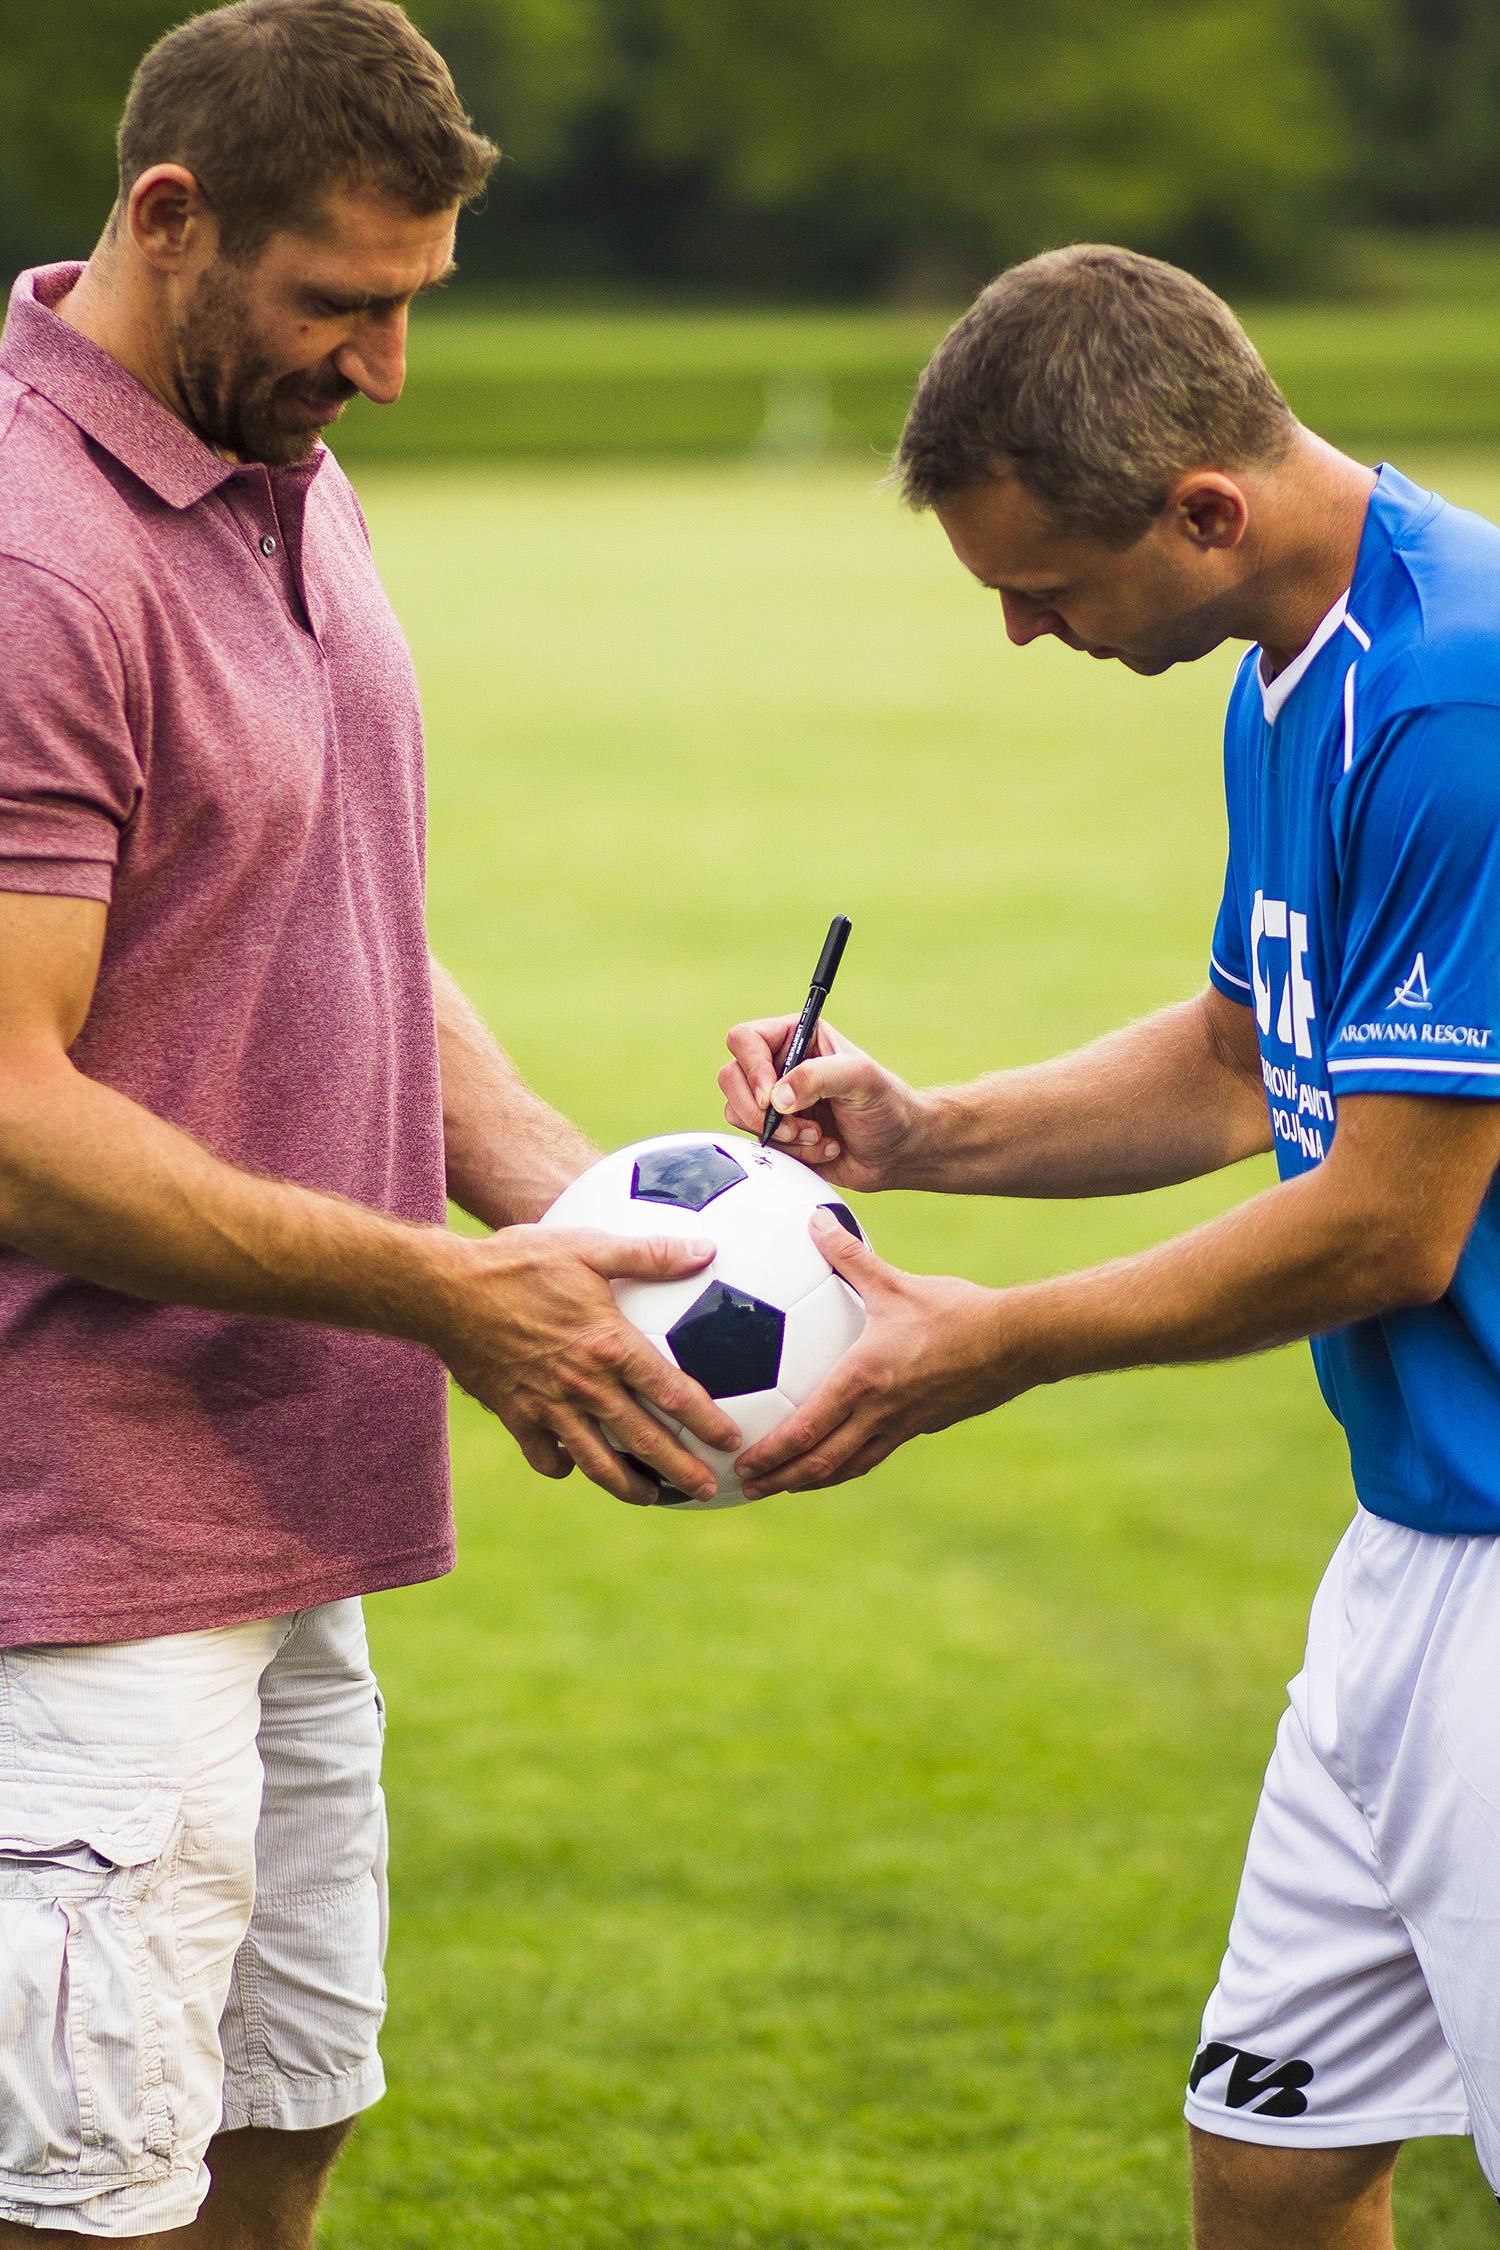 podpis míče